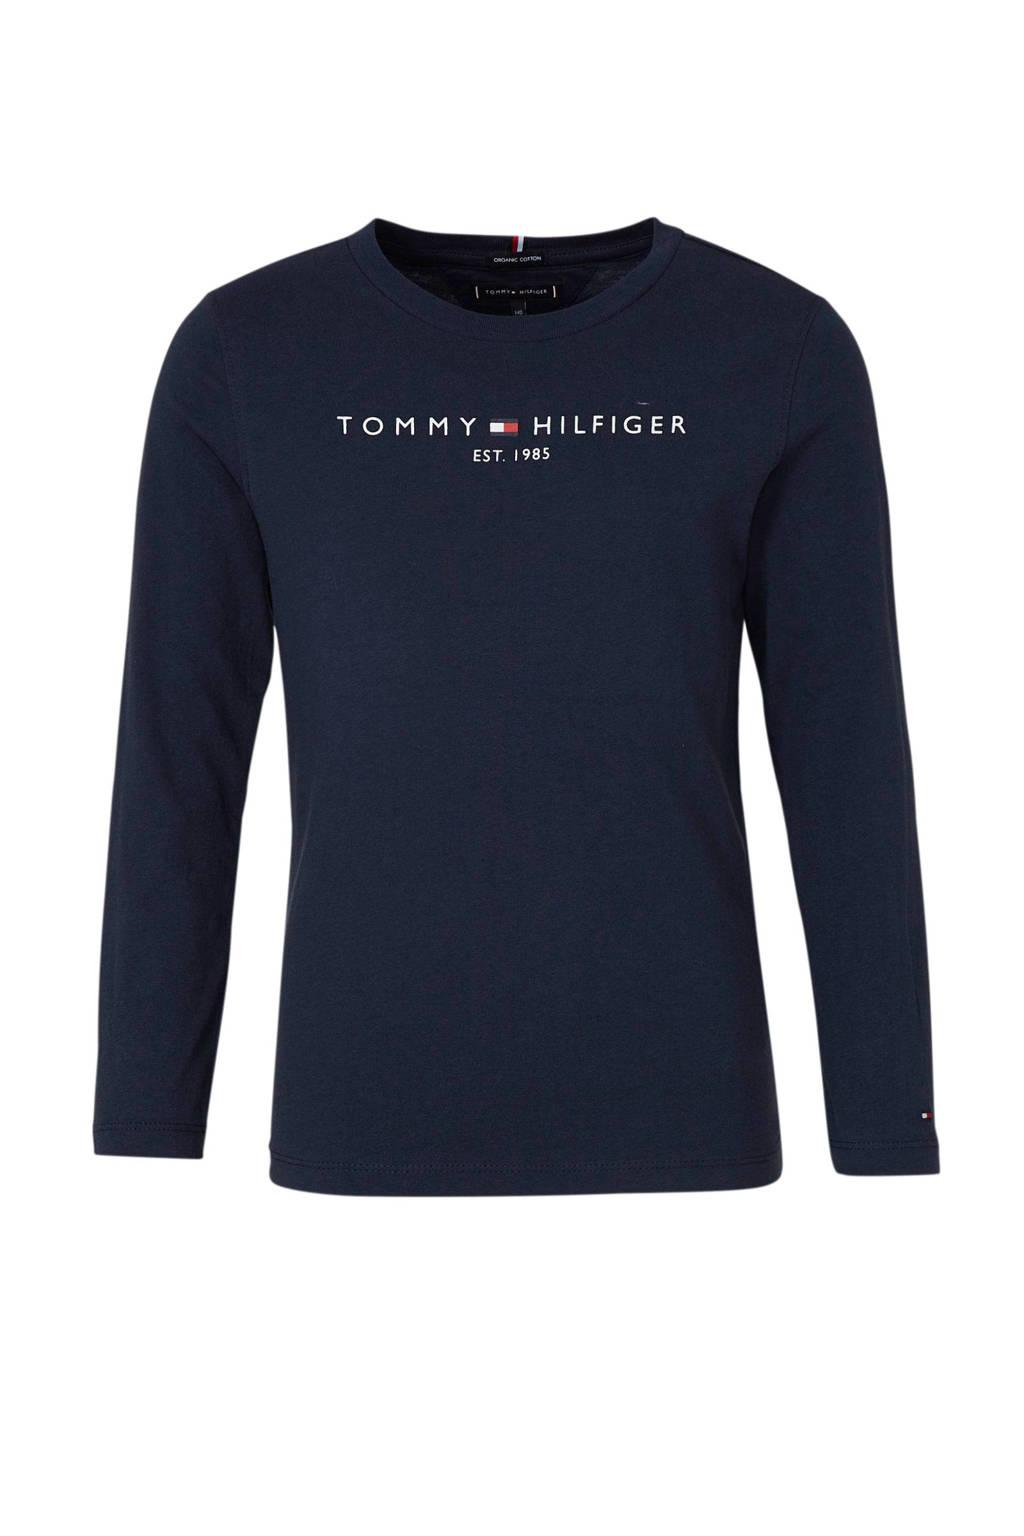 Tommy Hilfiger longsleeve met logo donkerblauw, Donkerblauw